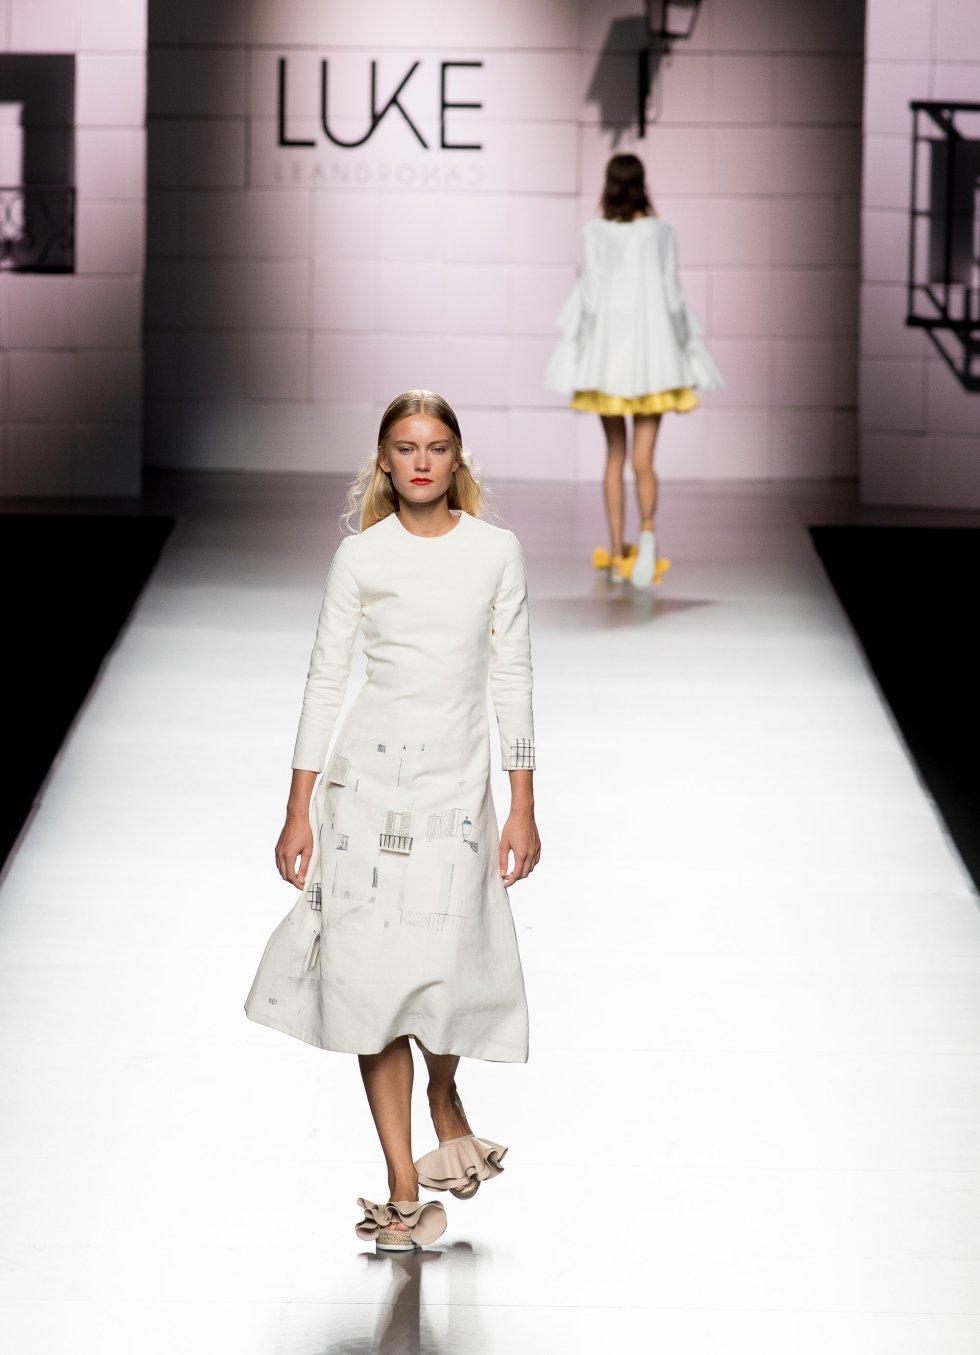 Modelo mostrando los diseños de  Luke Leandro Cano.